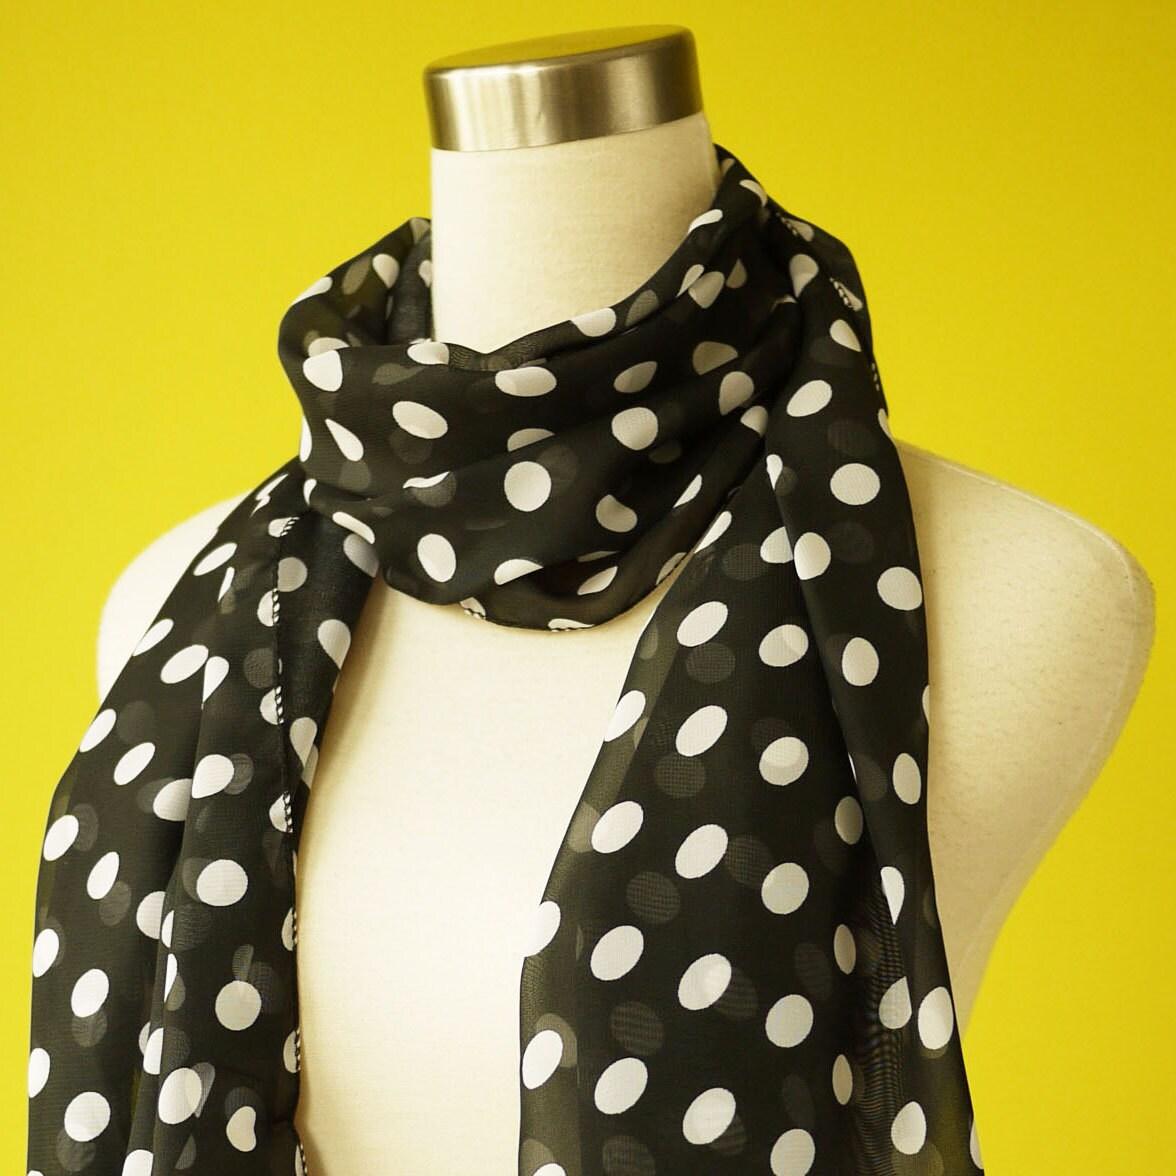 black polka dot scarf classic chiffon causal scarf